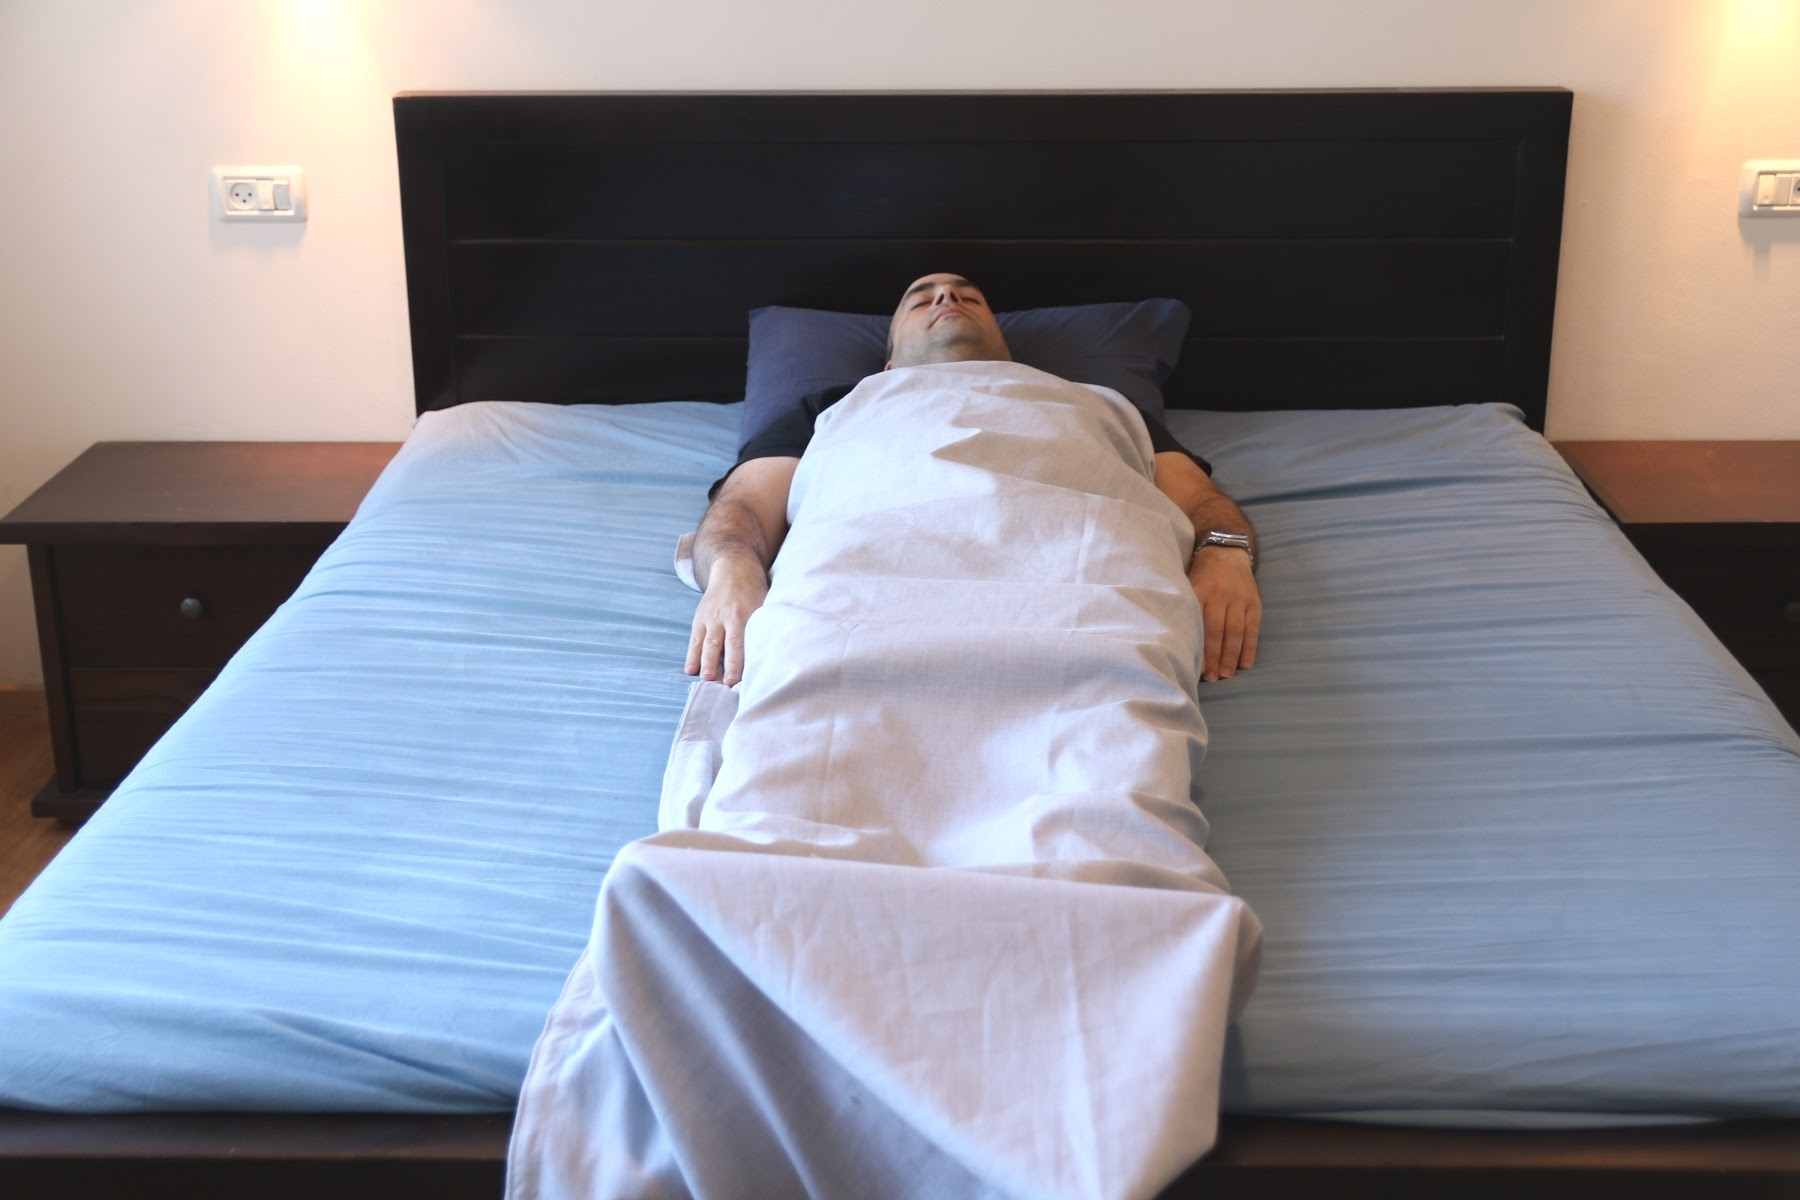 RF PROTECTION BLANKET\SLEEPING BAG